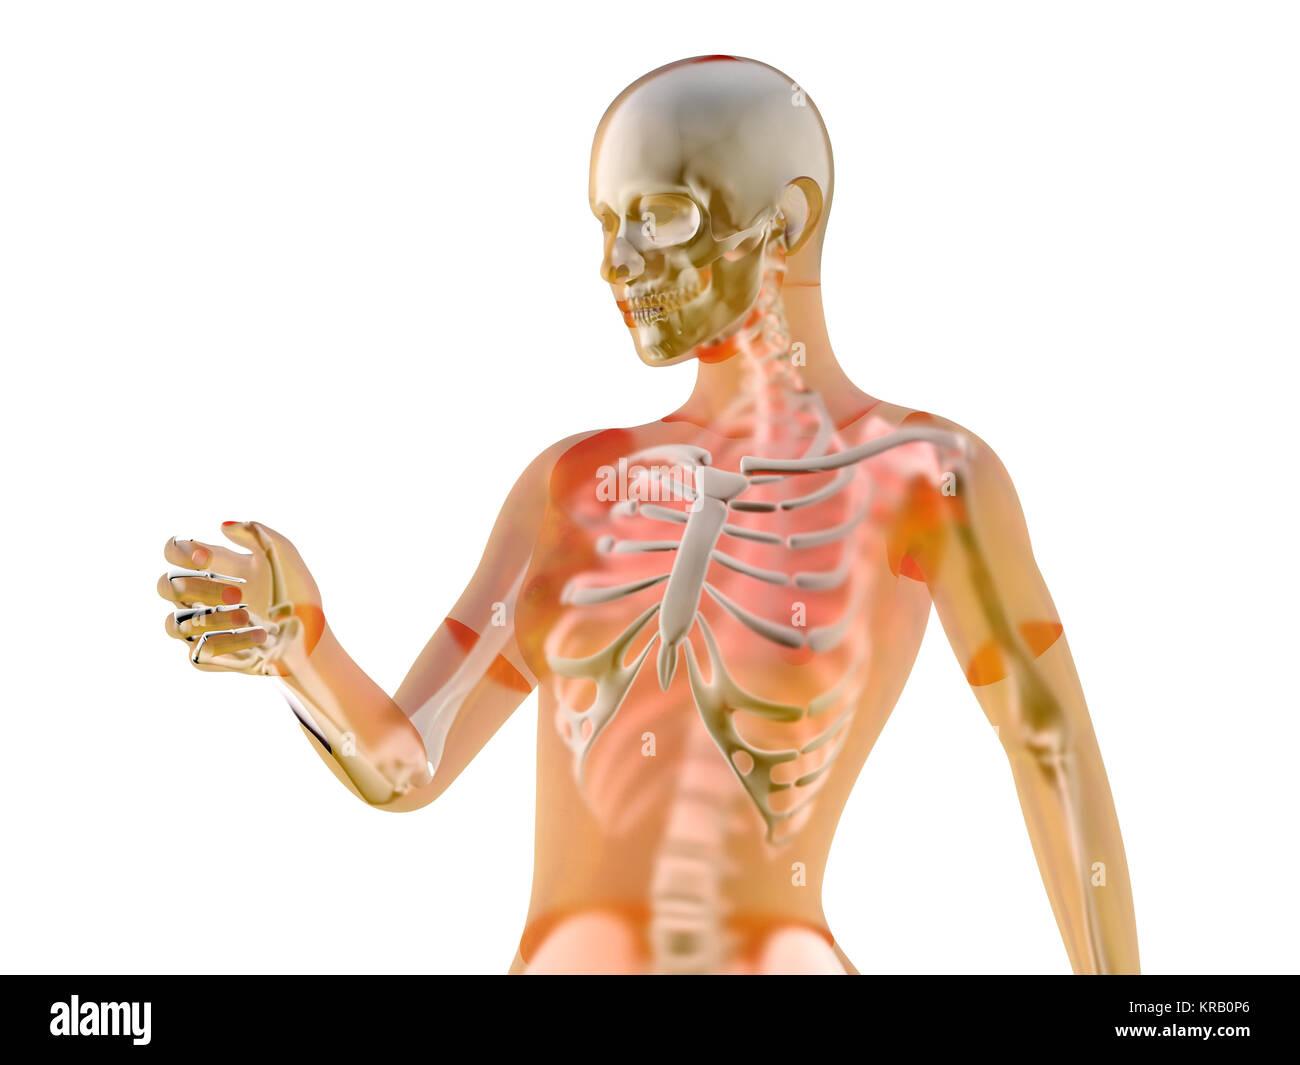 Anatomical Diagram Body Stockfotos & Anatomical Diagram Body Bilder ...